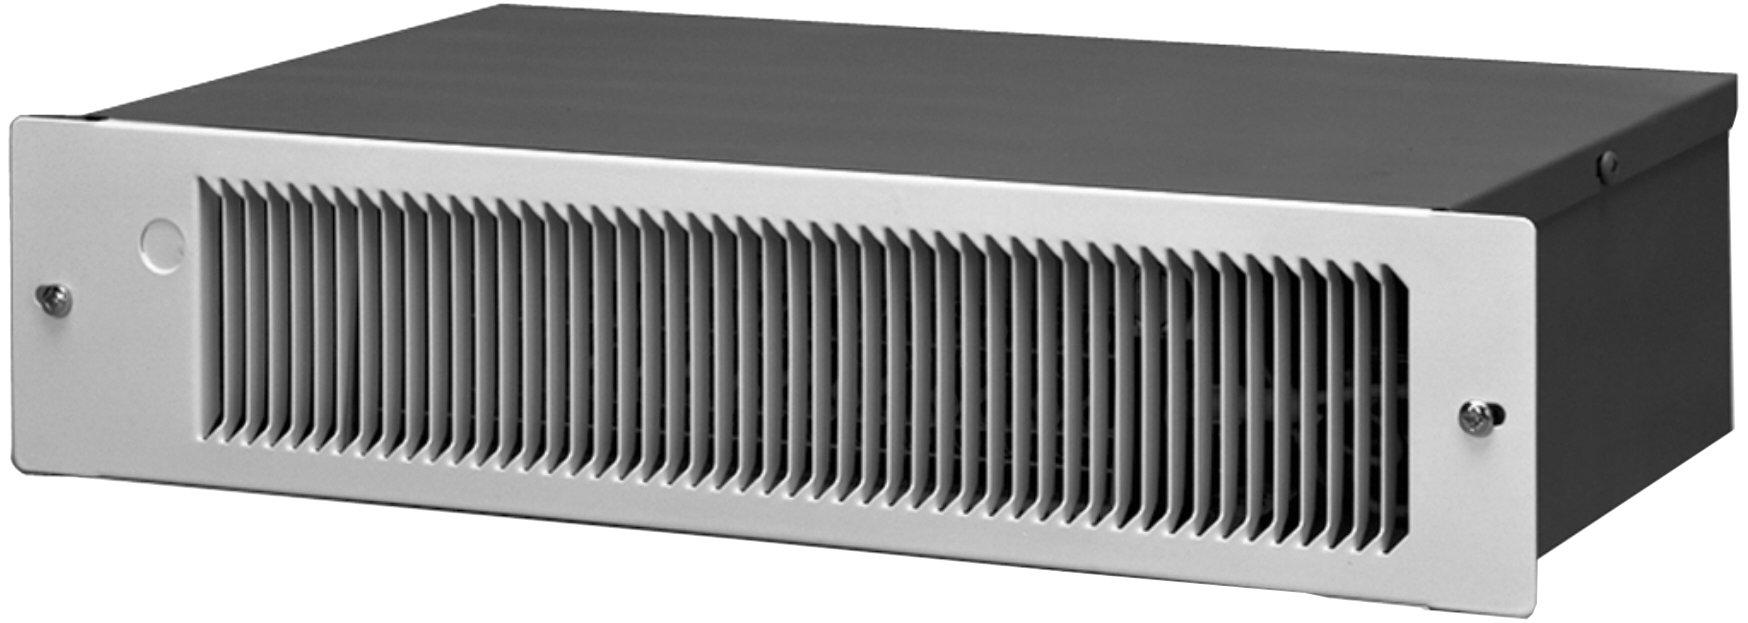 King Electric KT2415-MW-W Kickspace Heater, White